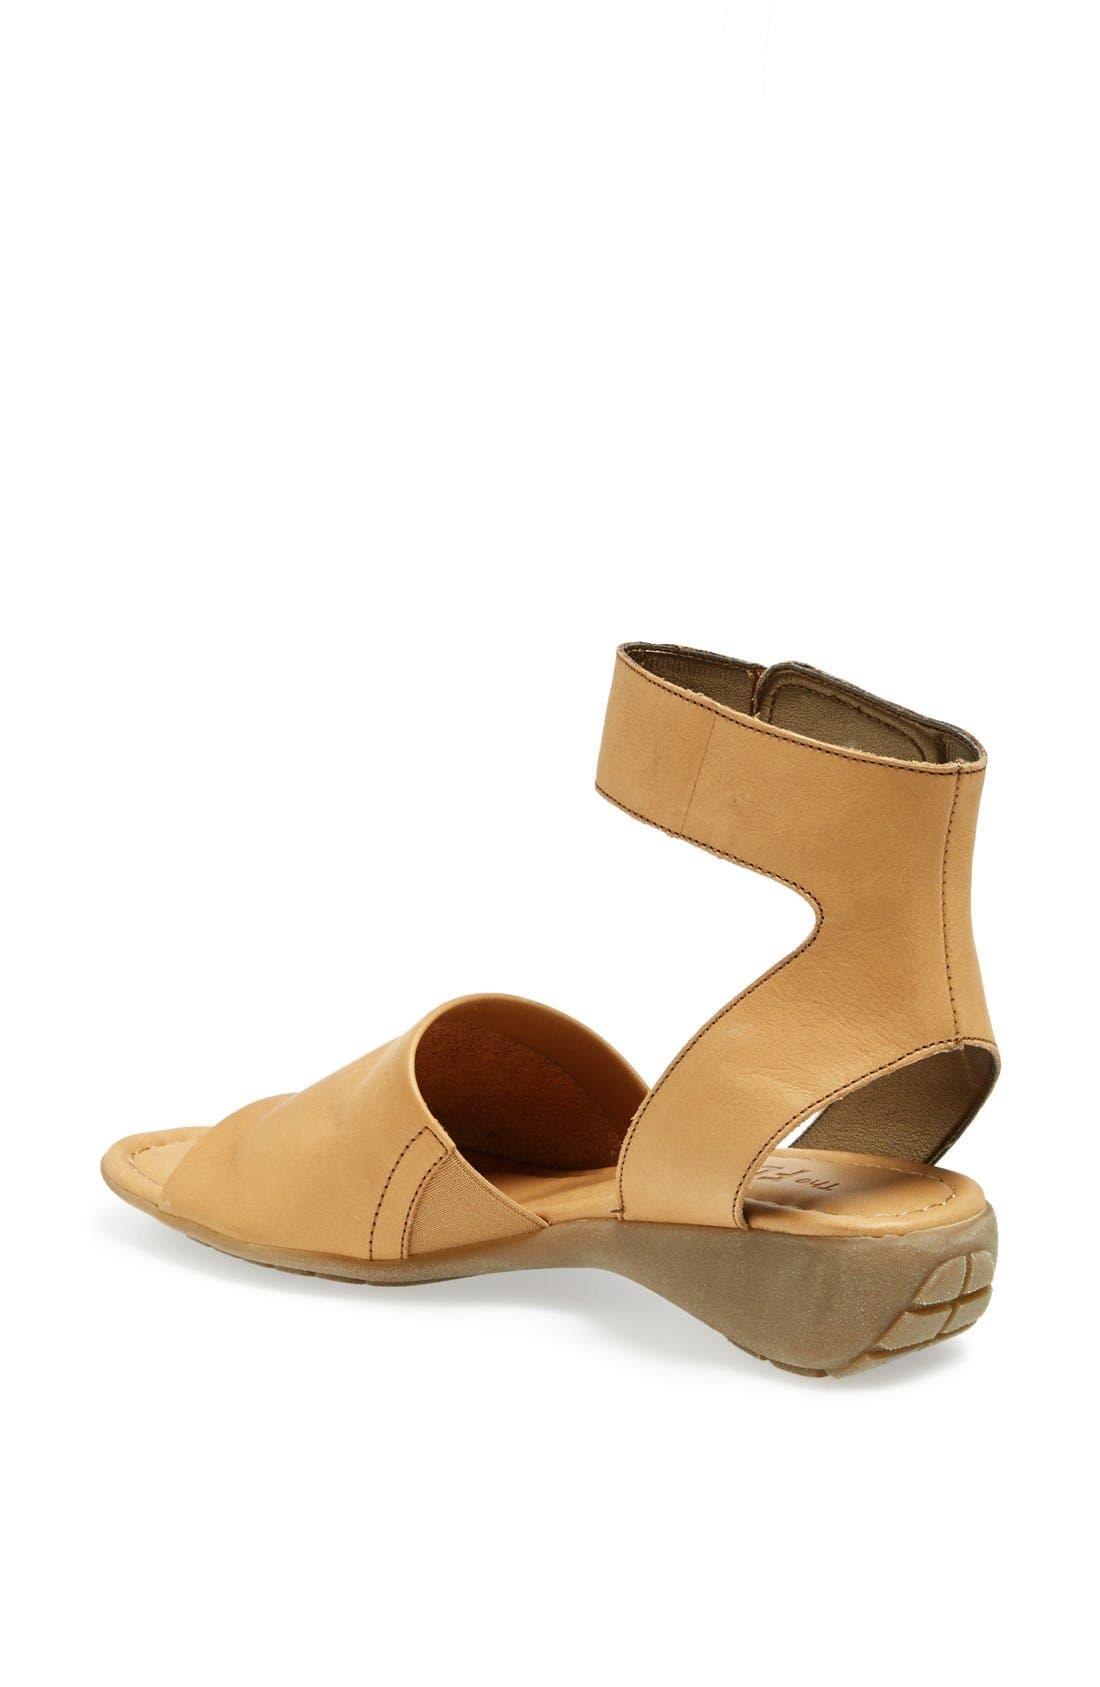 'Beglad' Leather Ankle Strap Sandal,                             Alternate thumbnail 25, color,